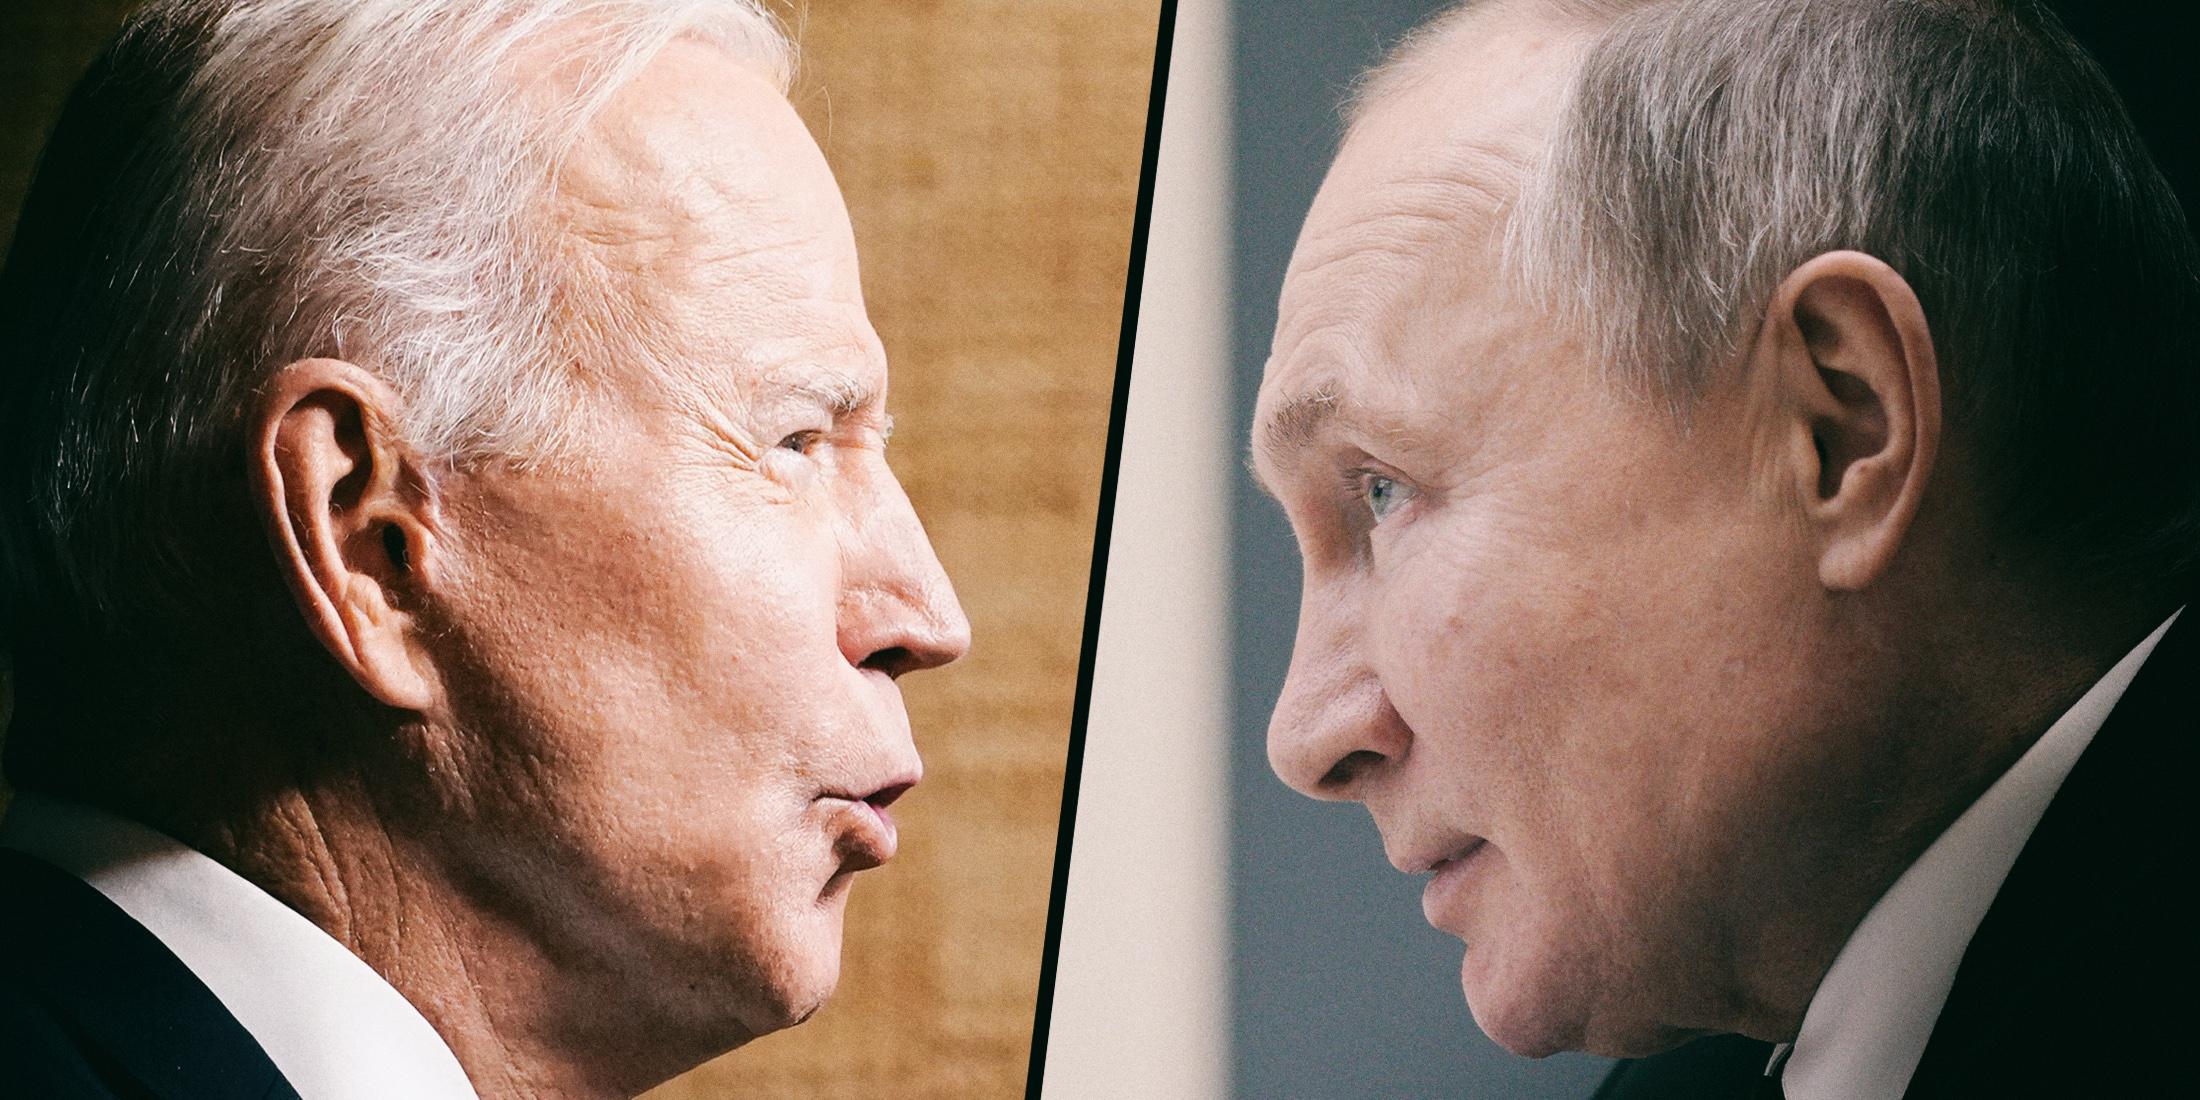 www.dailymaverick.co.za: Iranian nukes, rattling Russian sabres on Ukrainian bor...